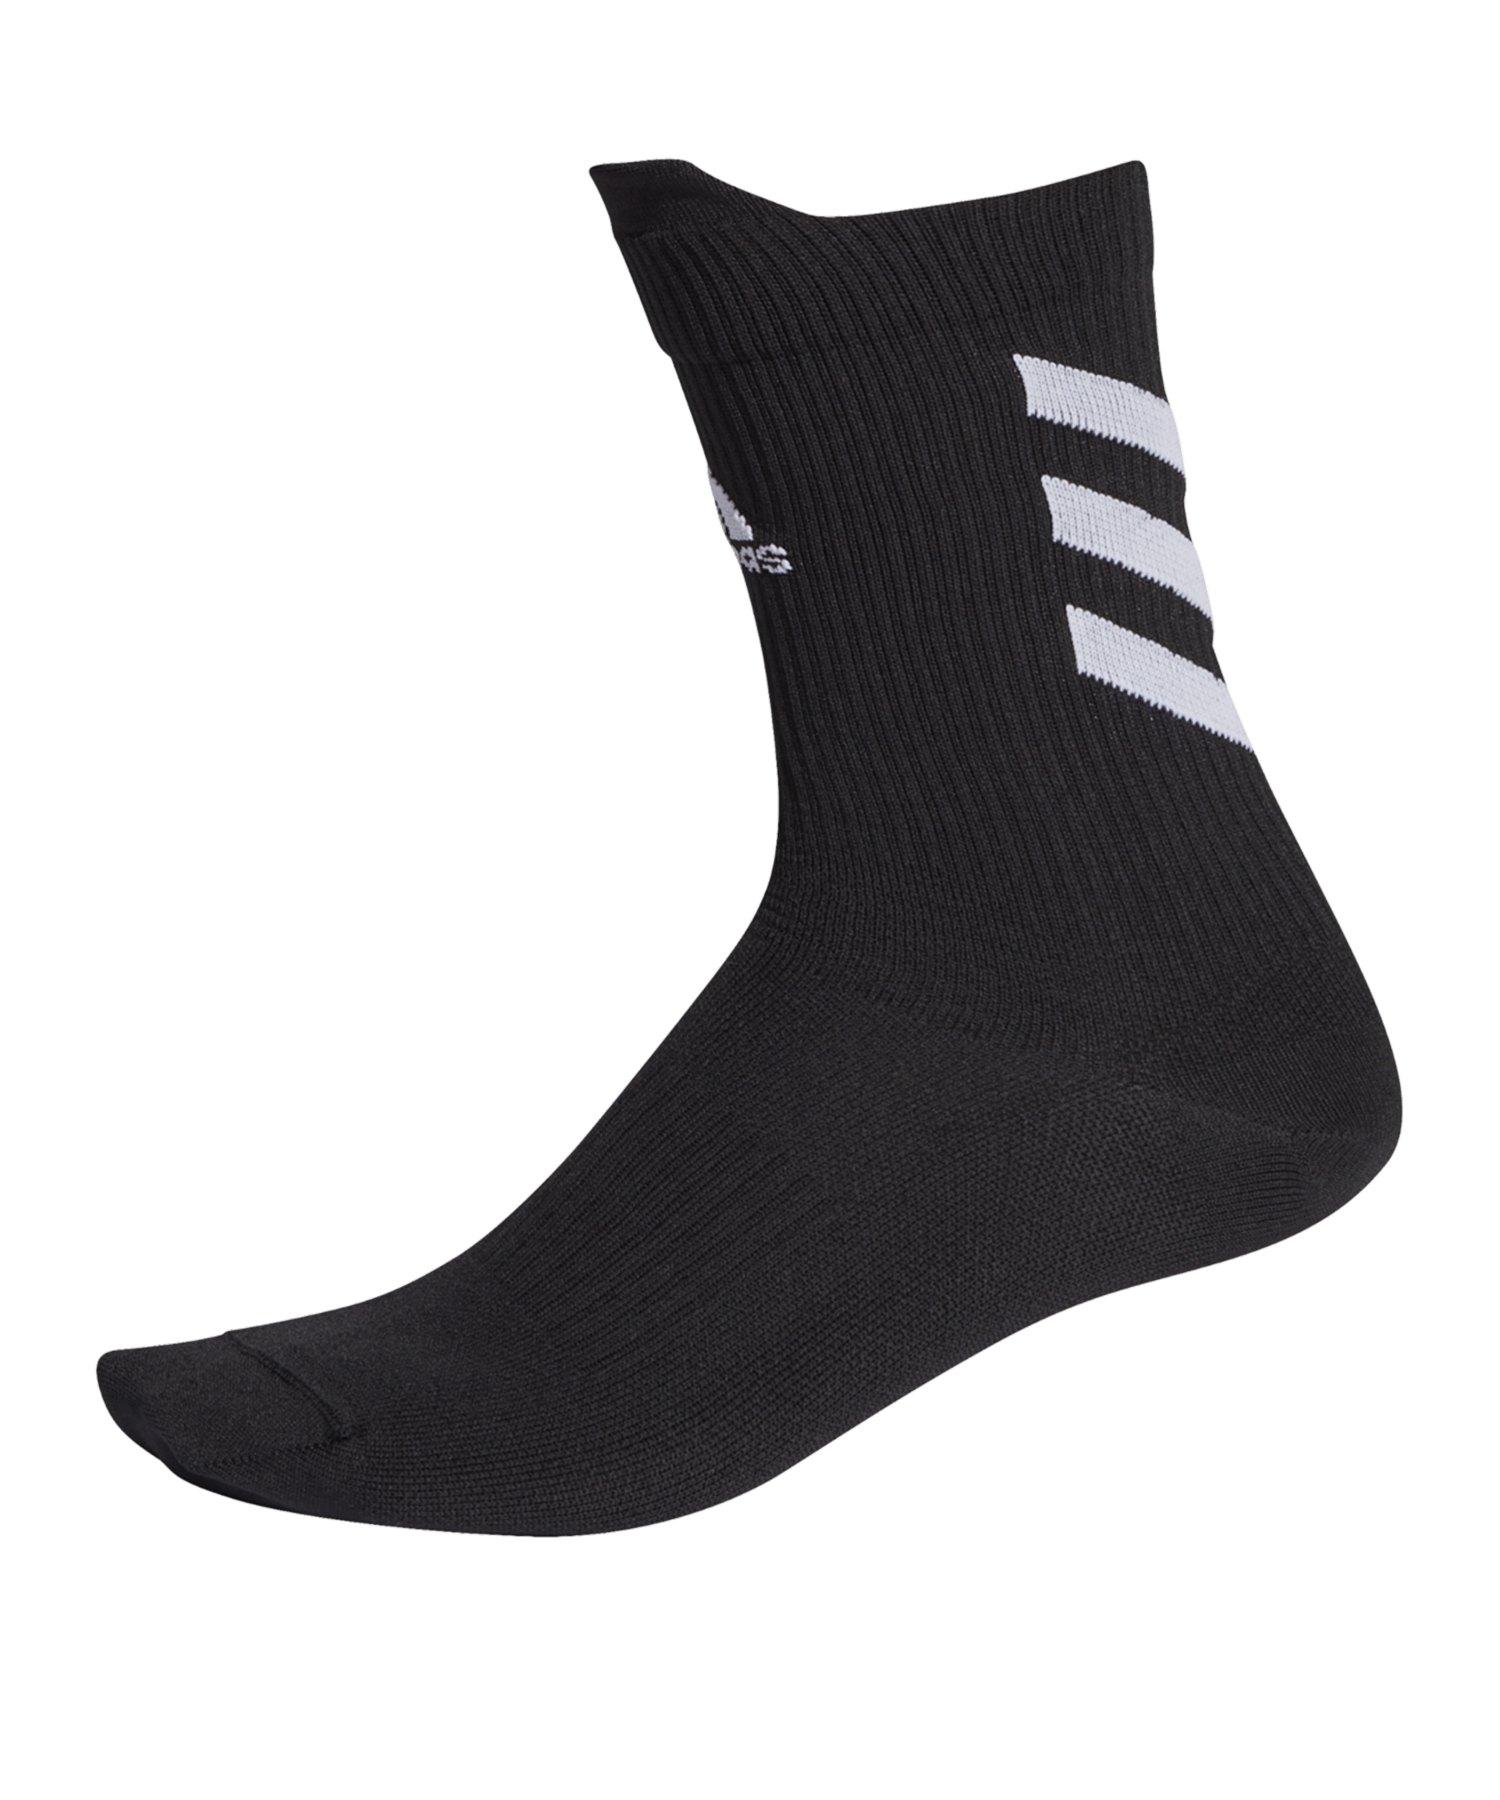 adidas Alphaskin Ultra Light Socken Schwarz - schwarz